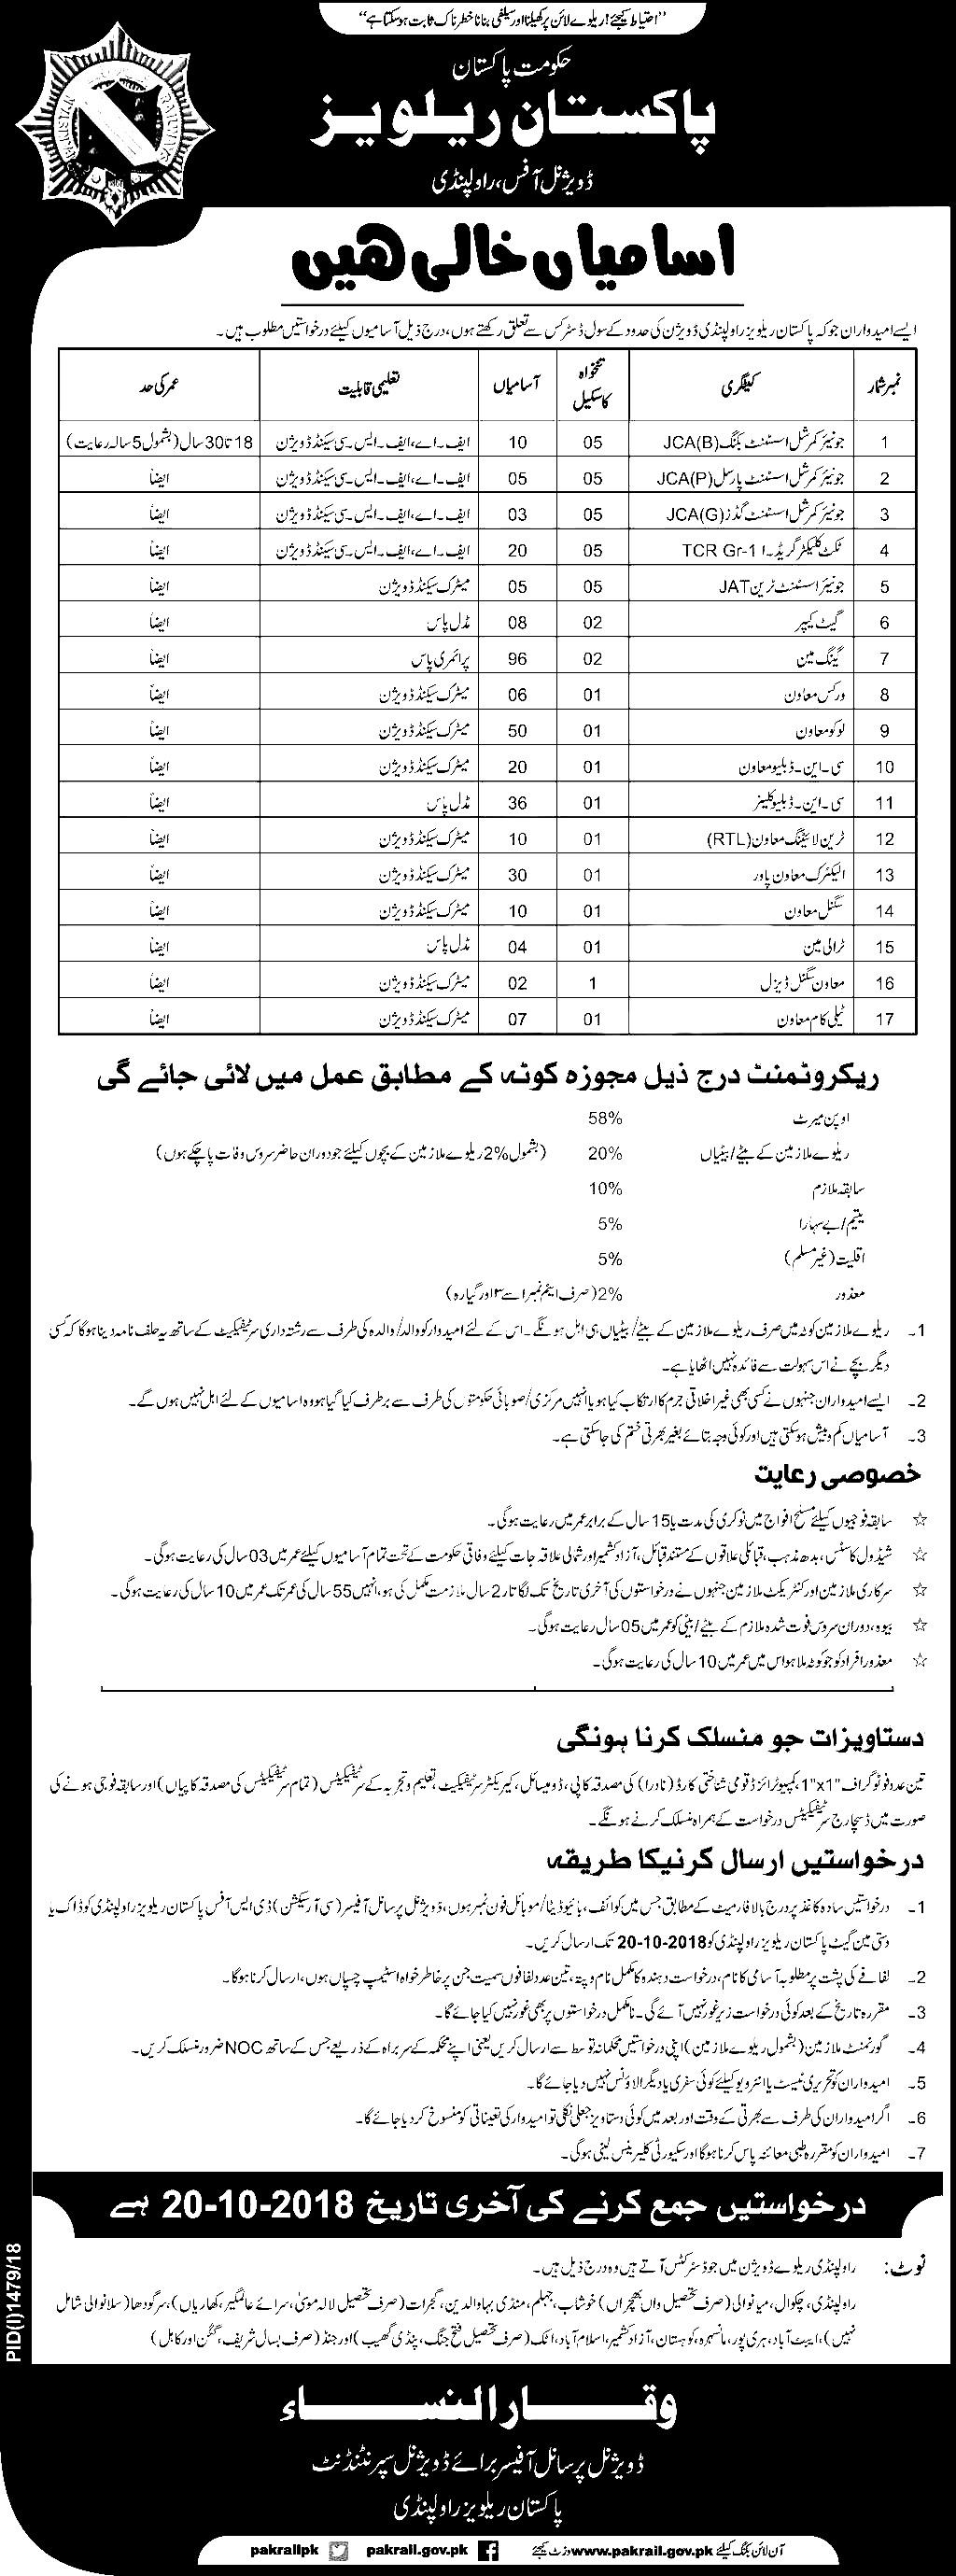 Pakistan Railways Jobs 2018 Application Form Download Online